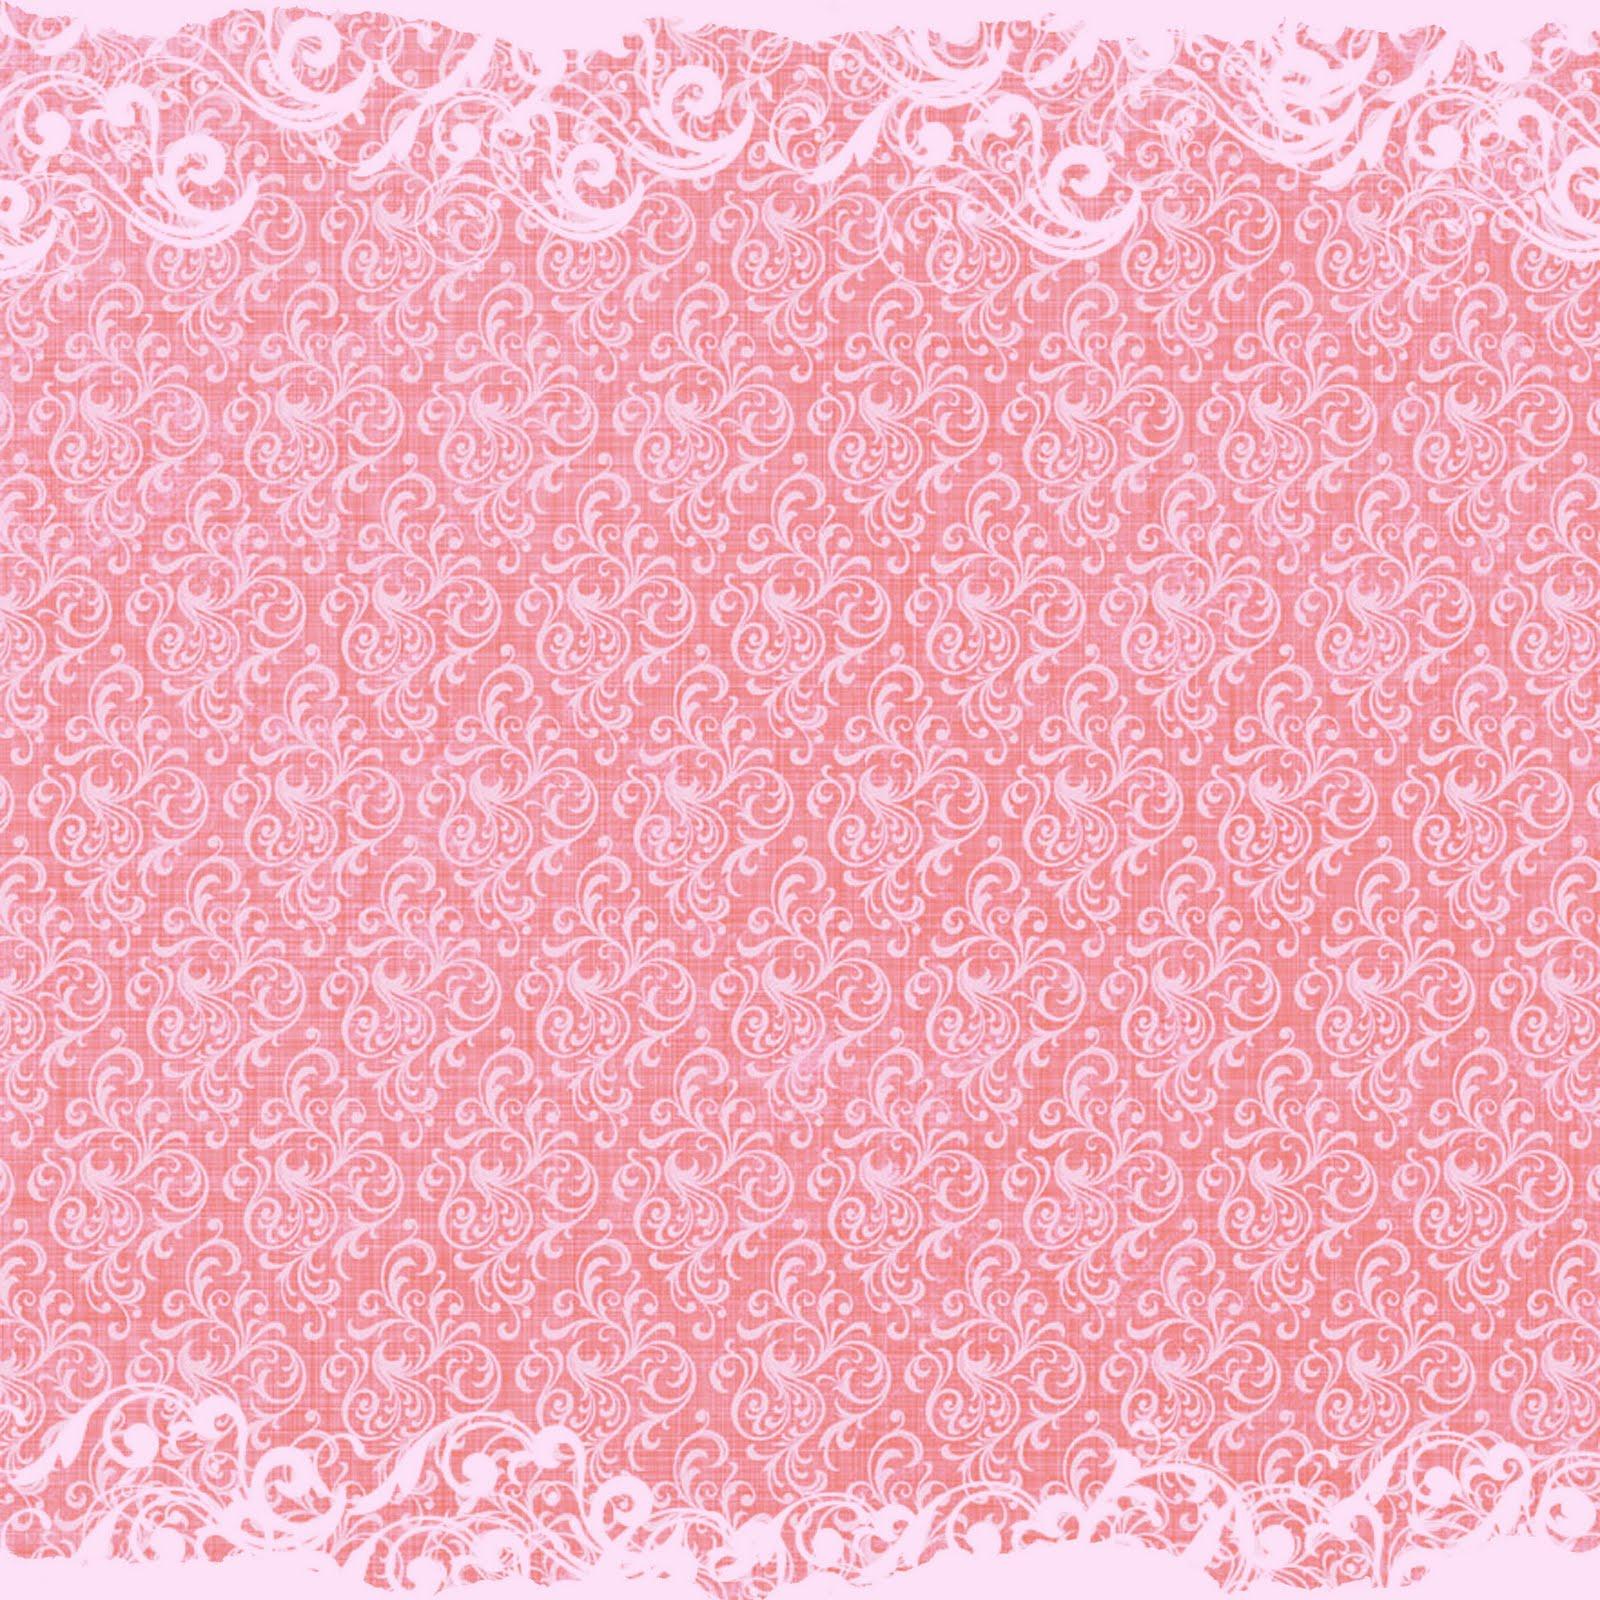 Scrapbook paper download - Free Digital Scrapbook Paper Pink Swirls